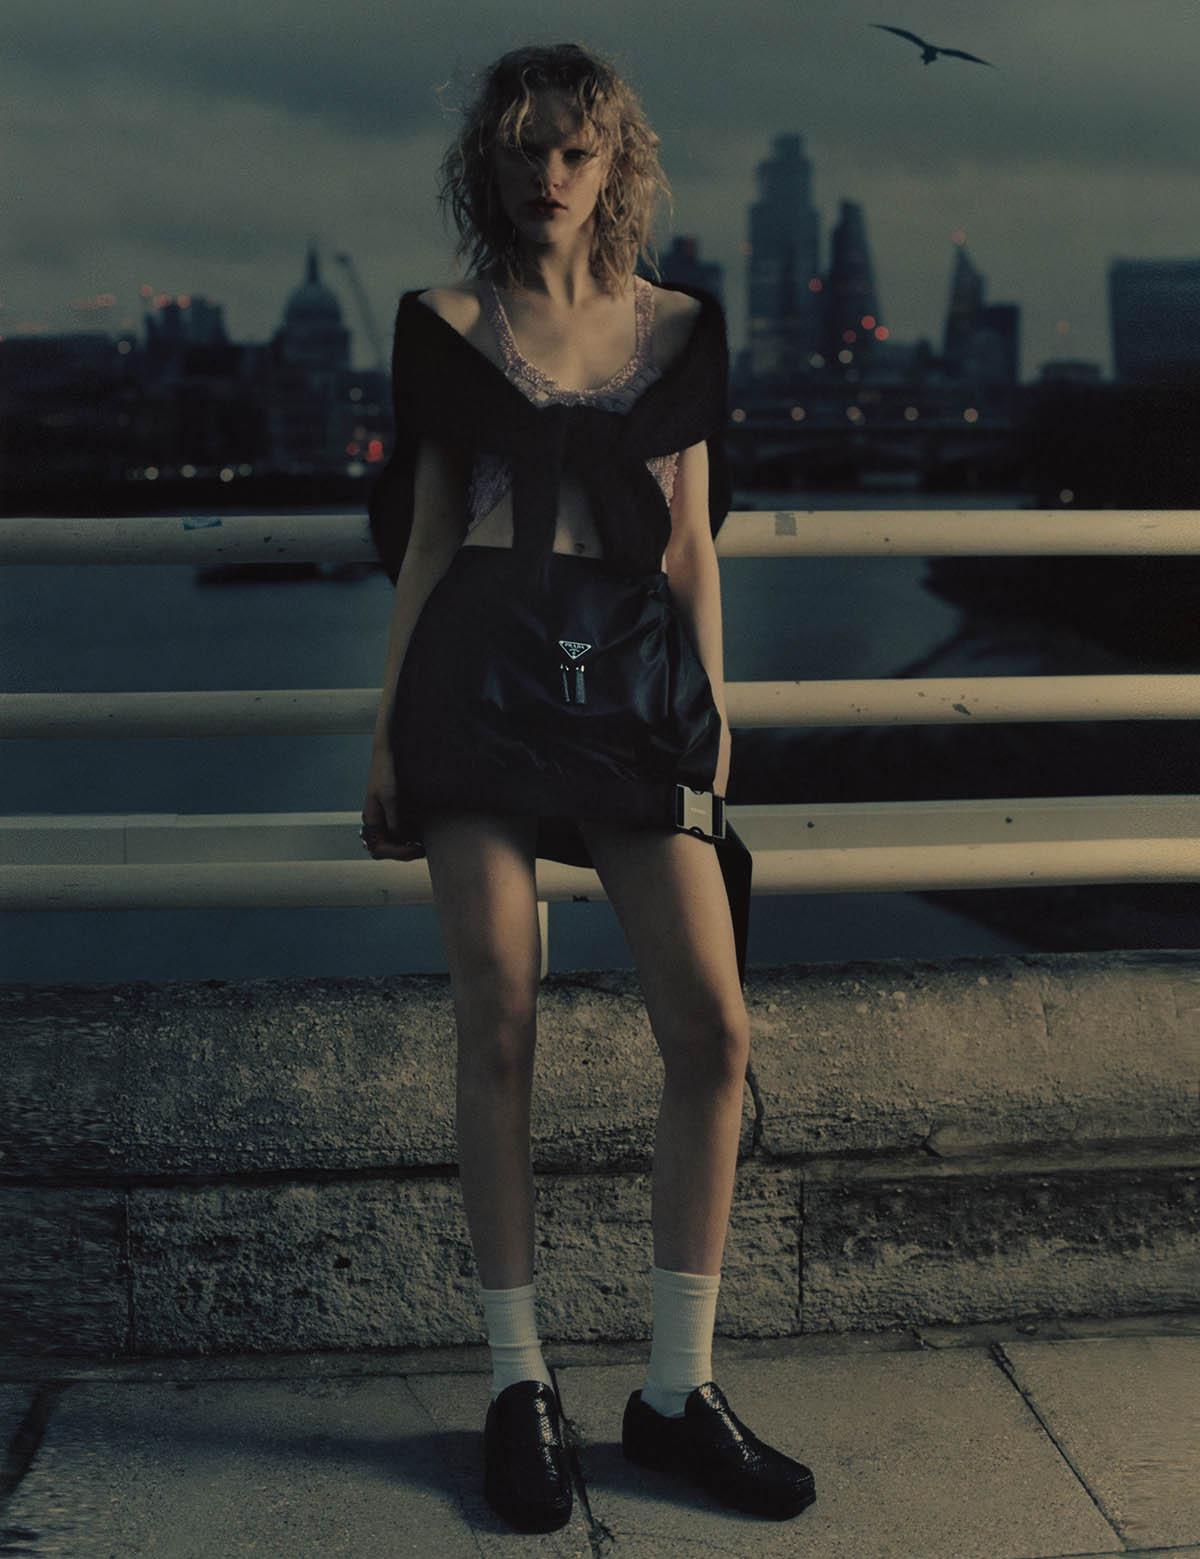 Hannah Motler by Robi Rodriguez for i-D Magazine Issue 362